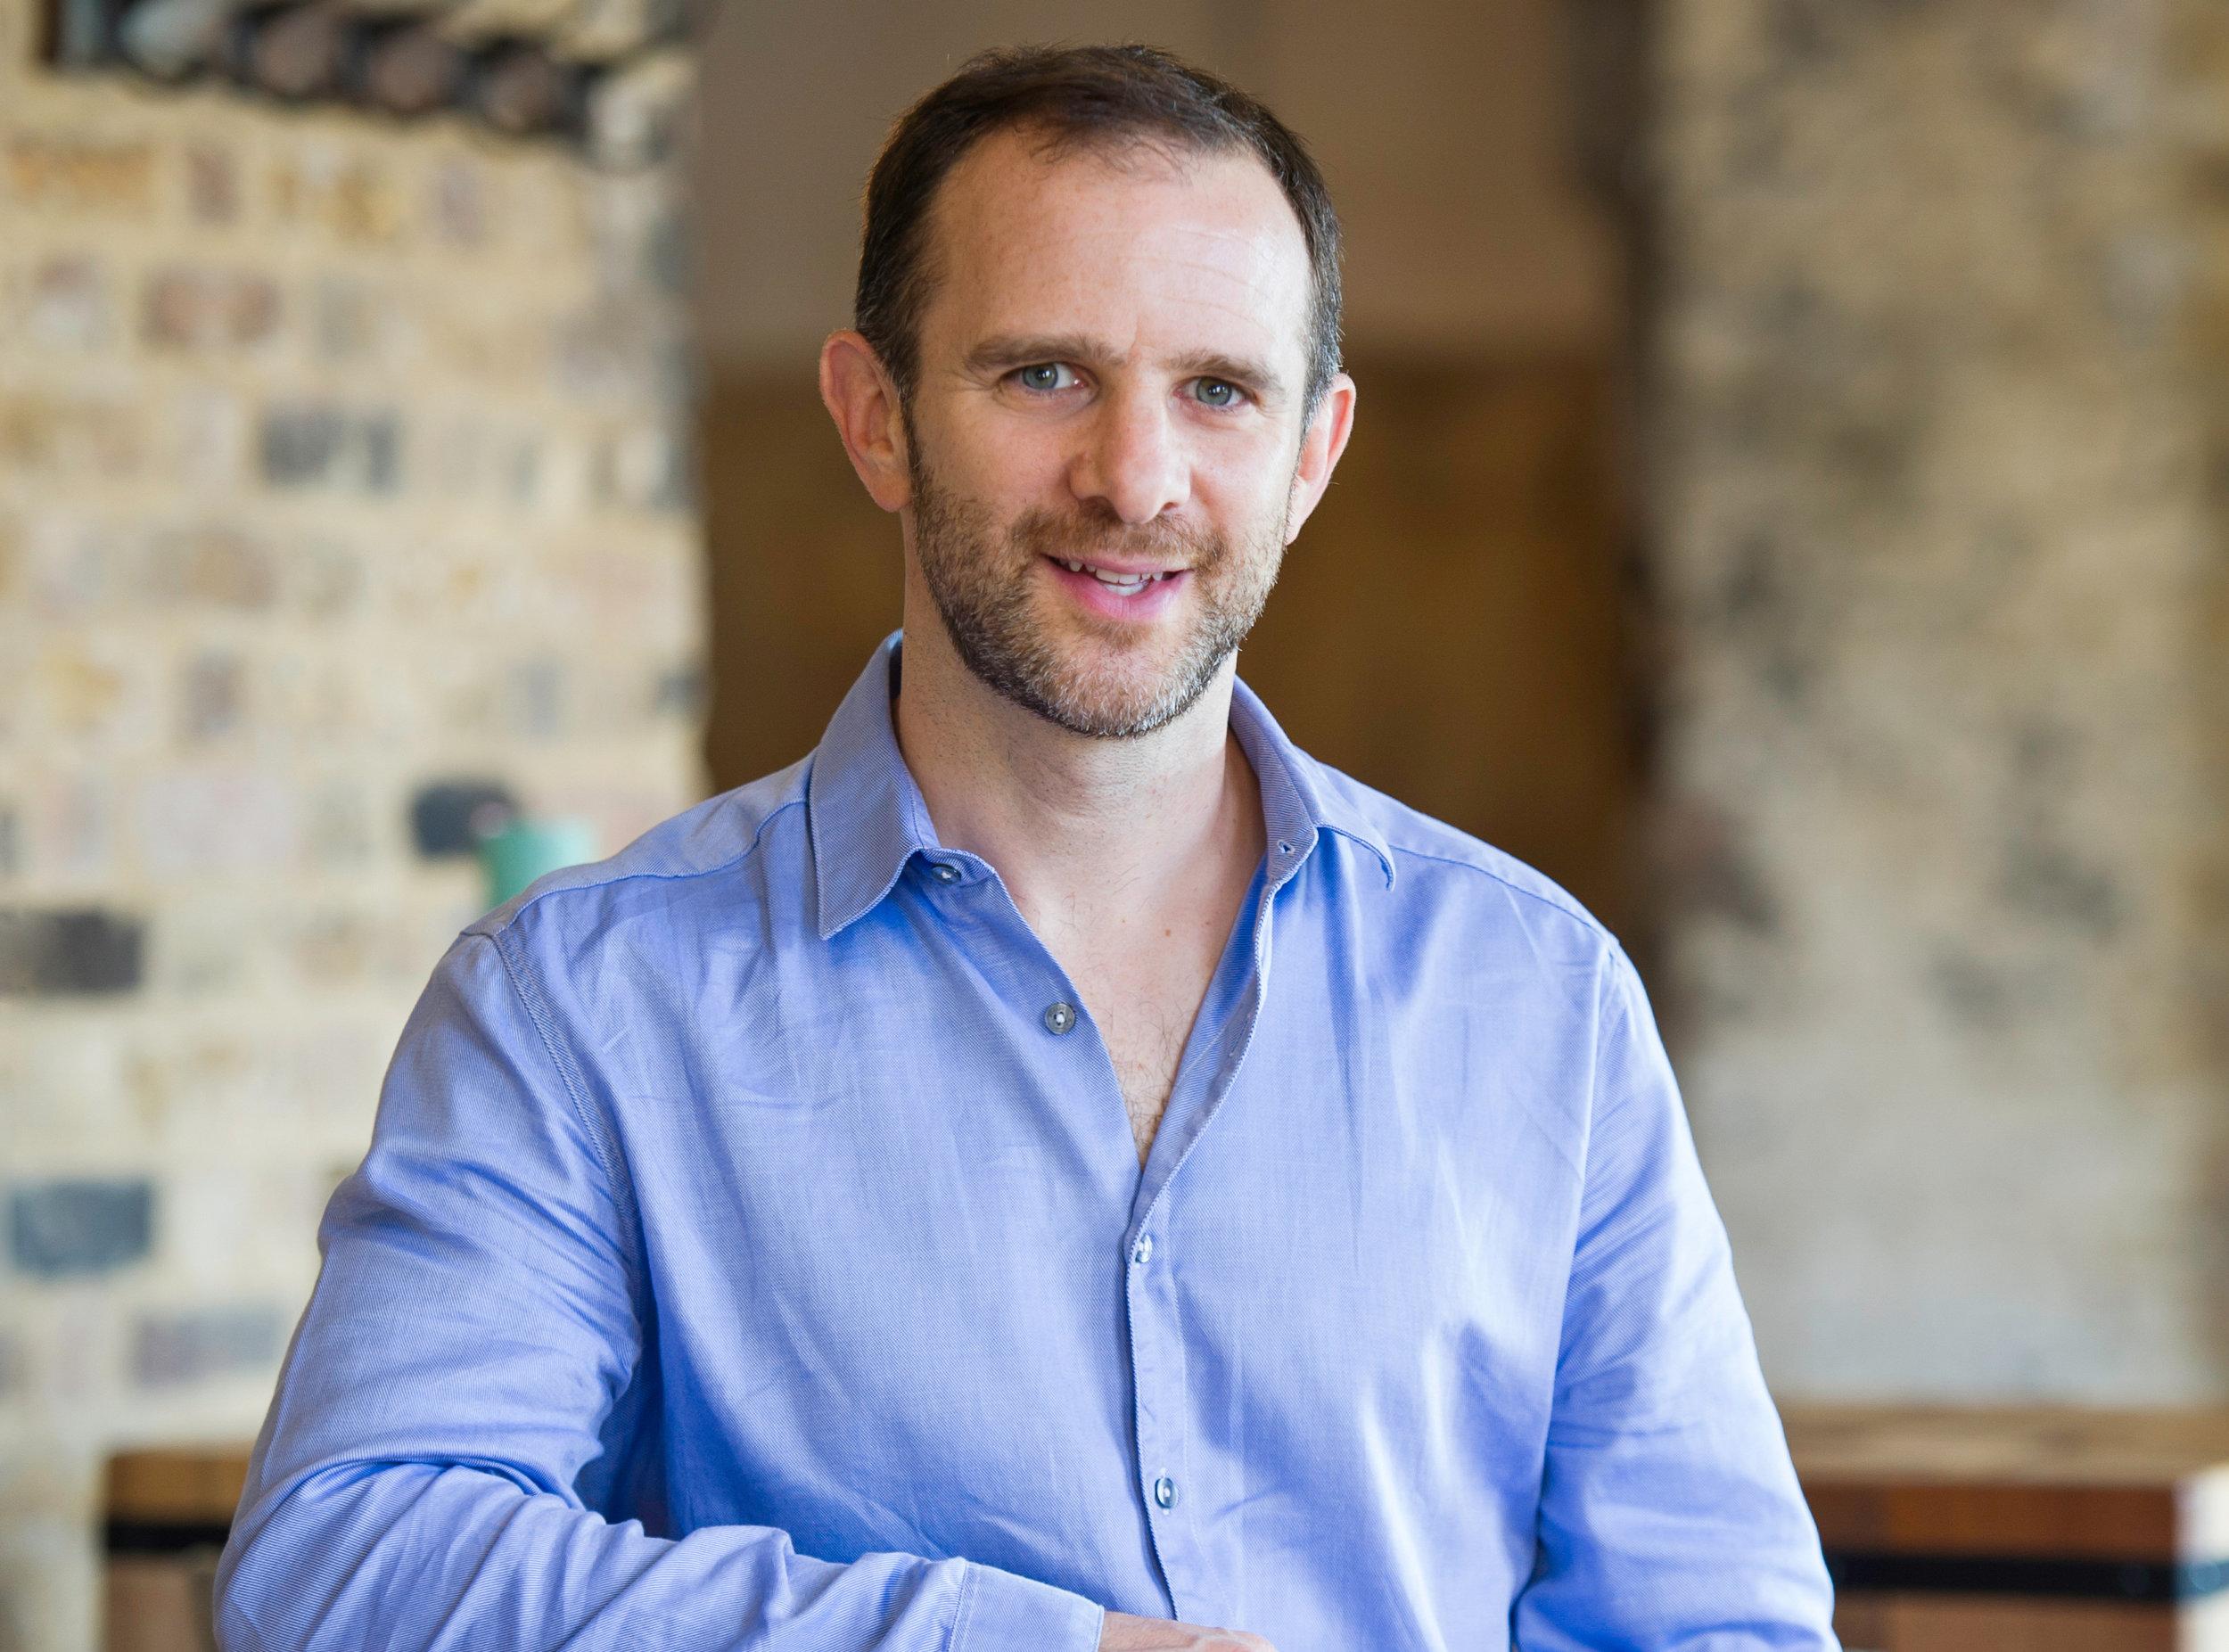 Co-founder / Partner - Sectors: Crypto and Blockchain, Computational Health, Machine Intelligence, Marketplaces, Next-Gen Finance